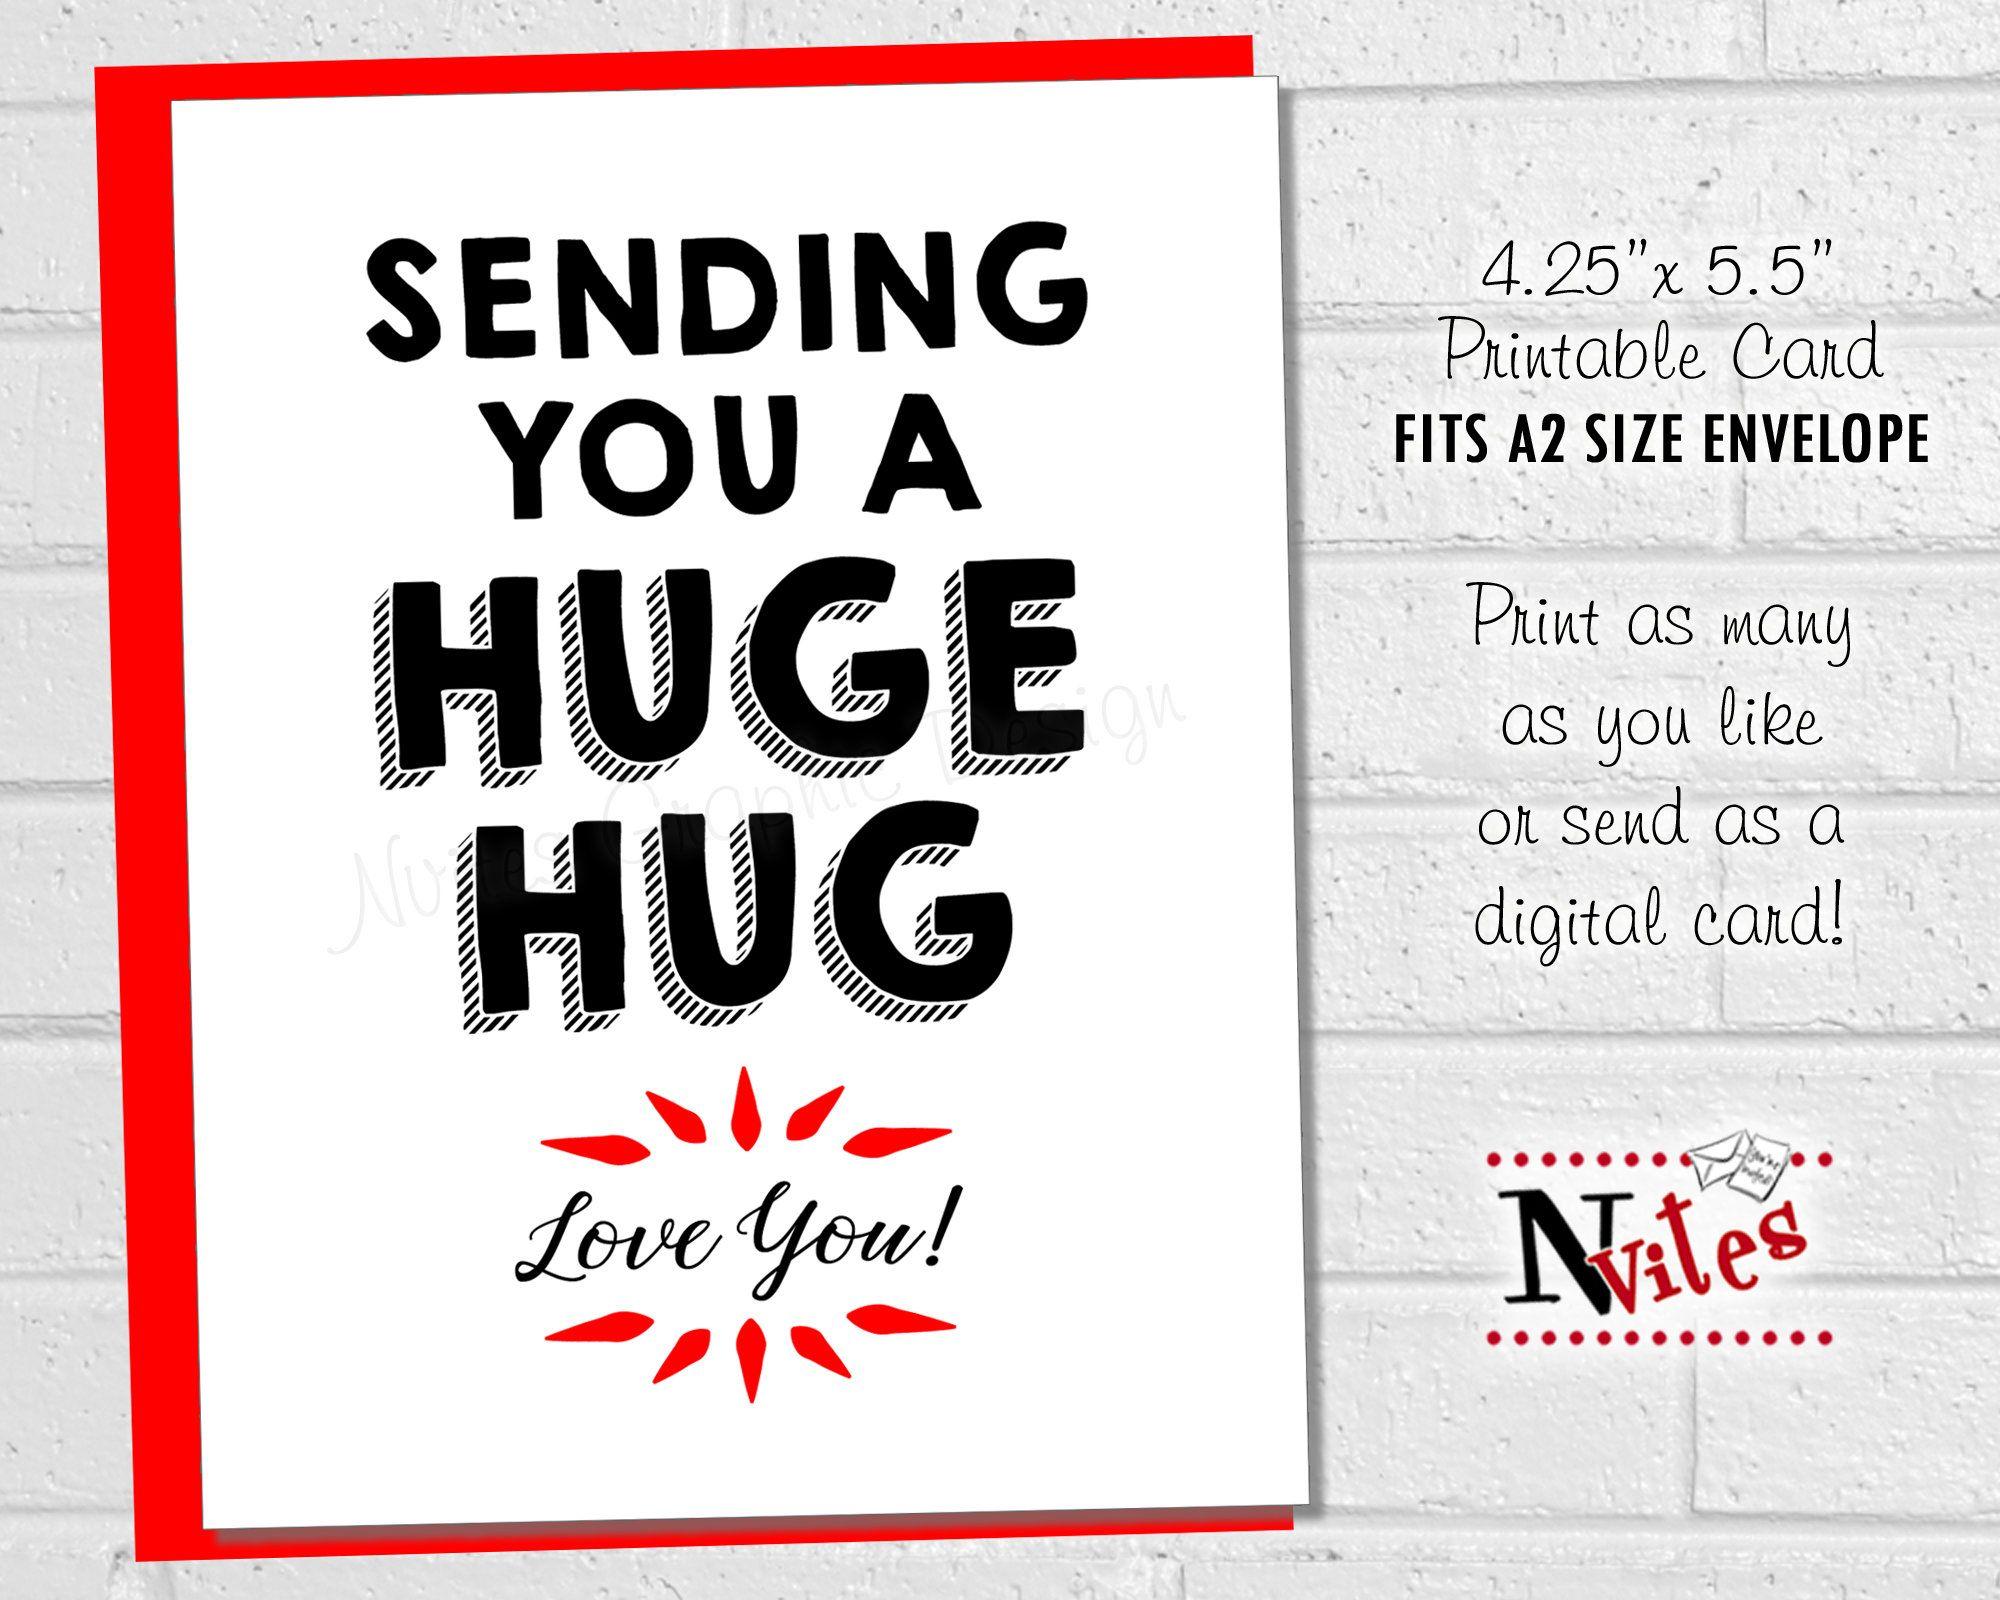 Hug Card, Sending You a Huge Hug, Get Well Card, Feel Good Card